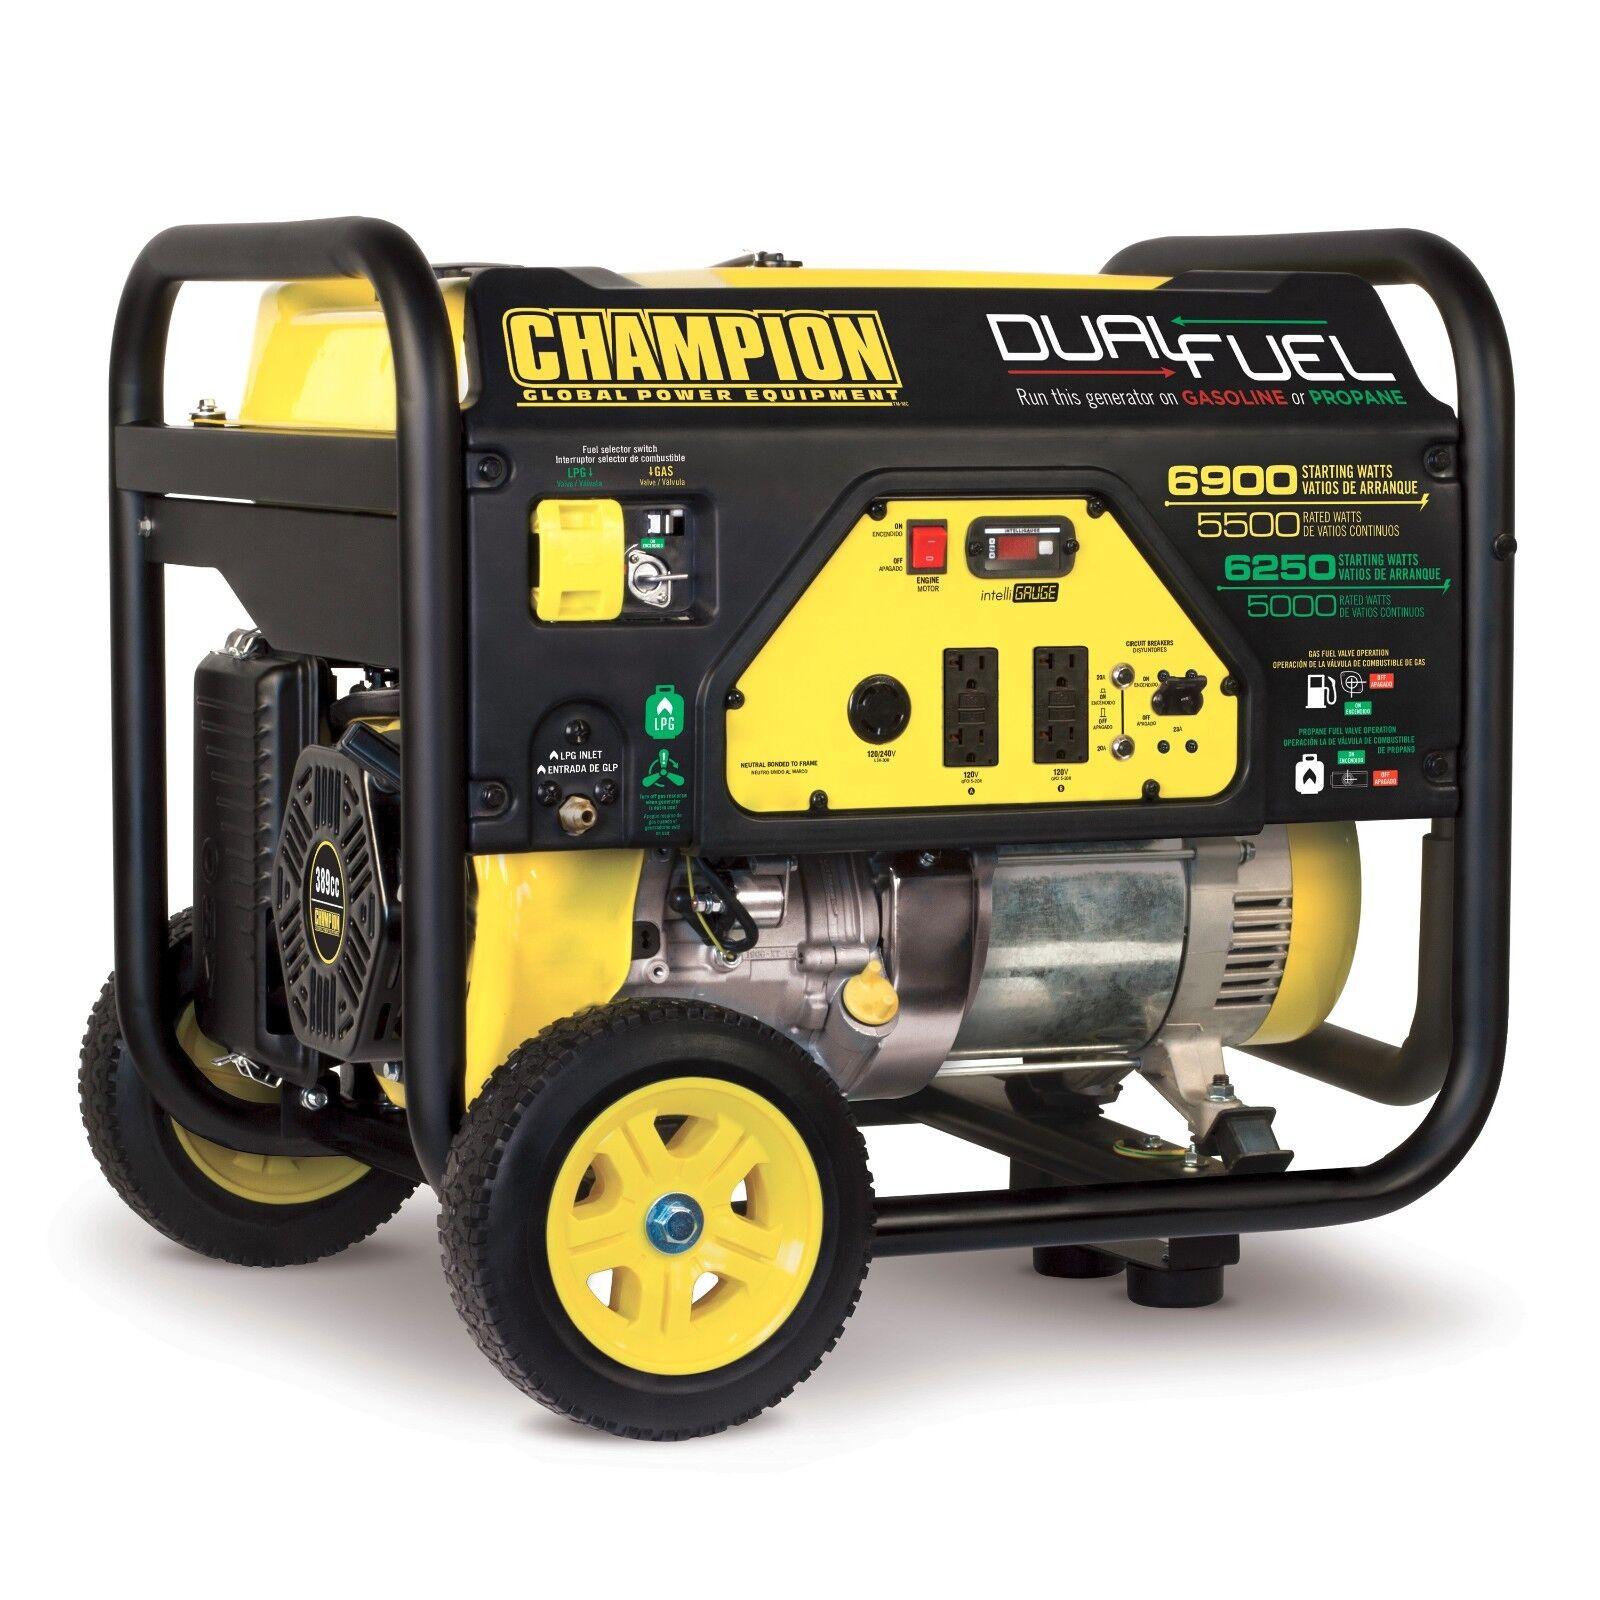 Champion Power Equipment Portable Generator 5500 Watt Dual Fuel 4 Stroke Engine For Sale Online Ebay